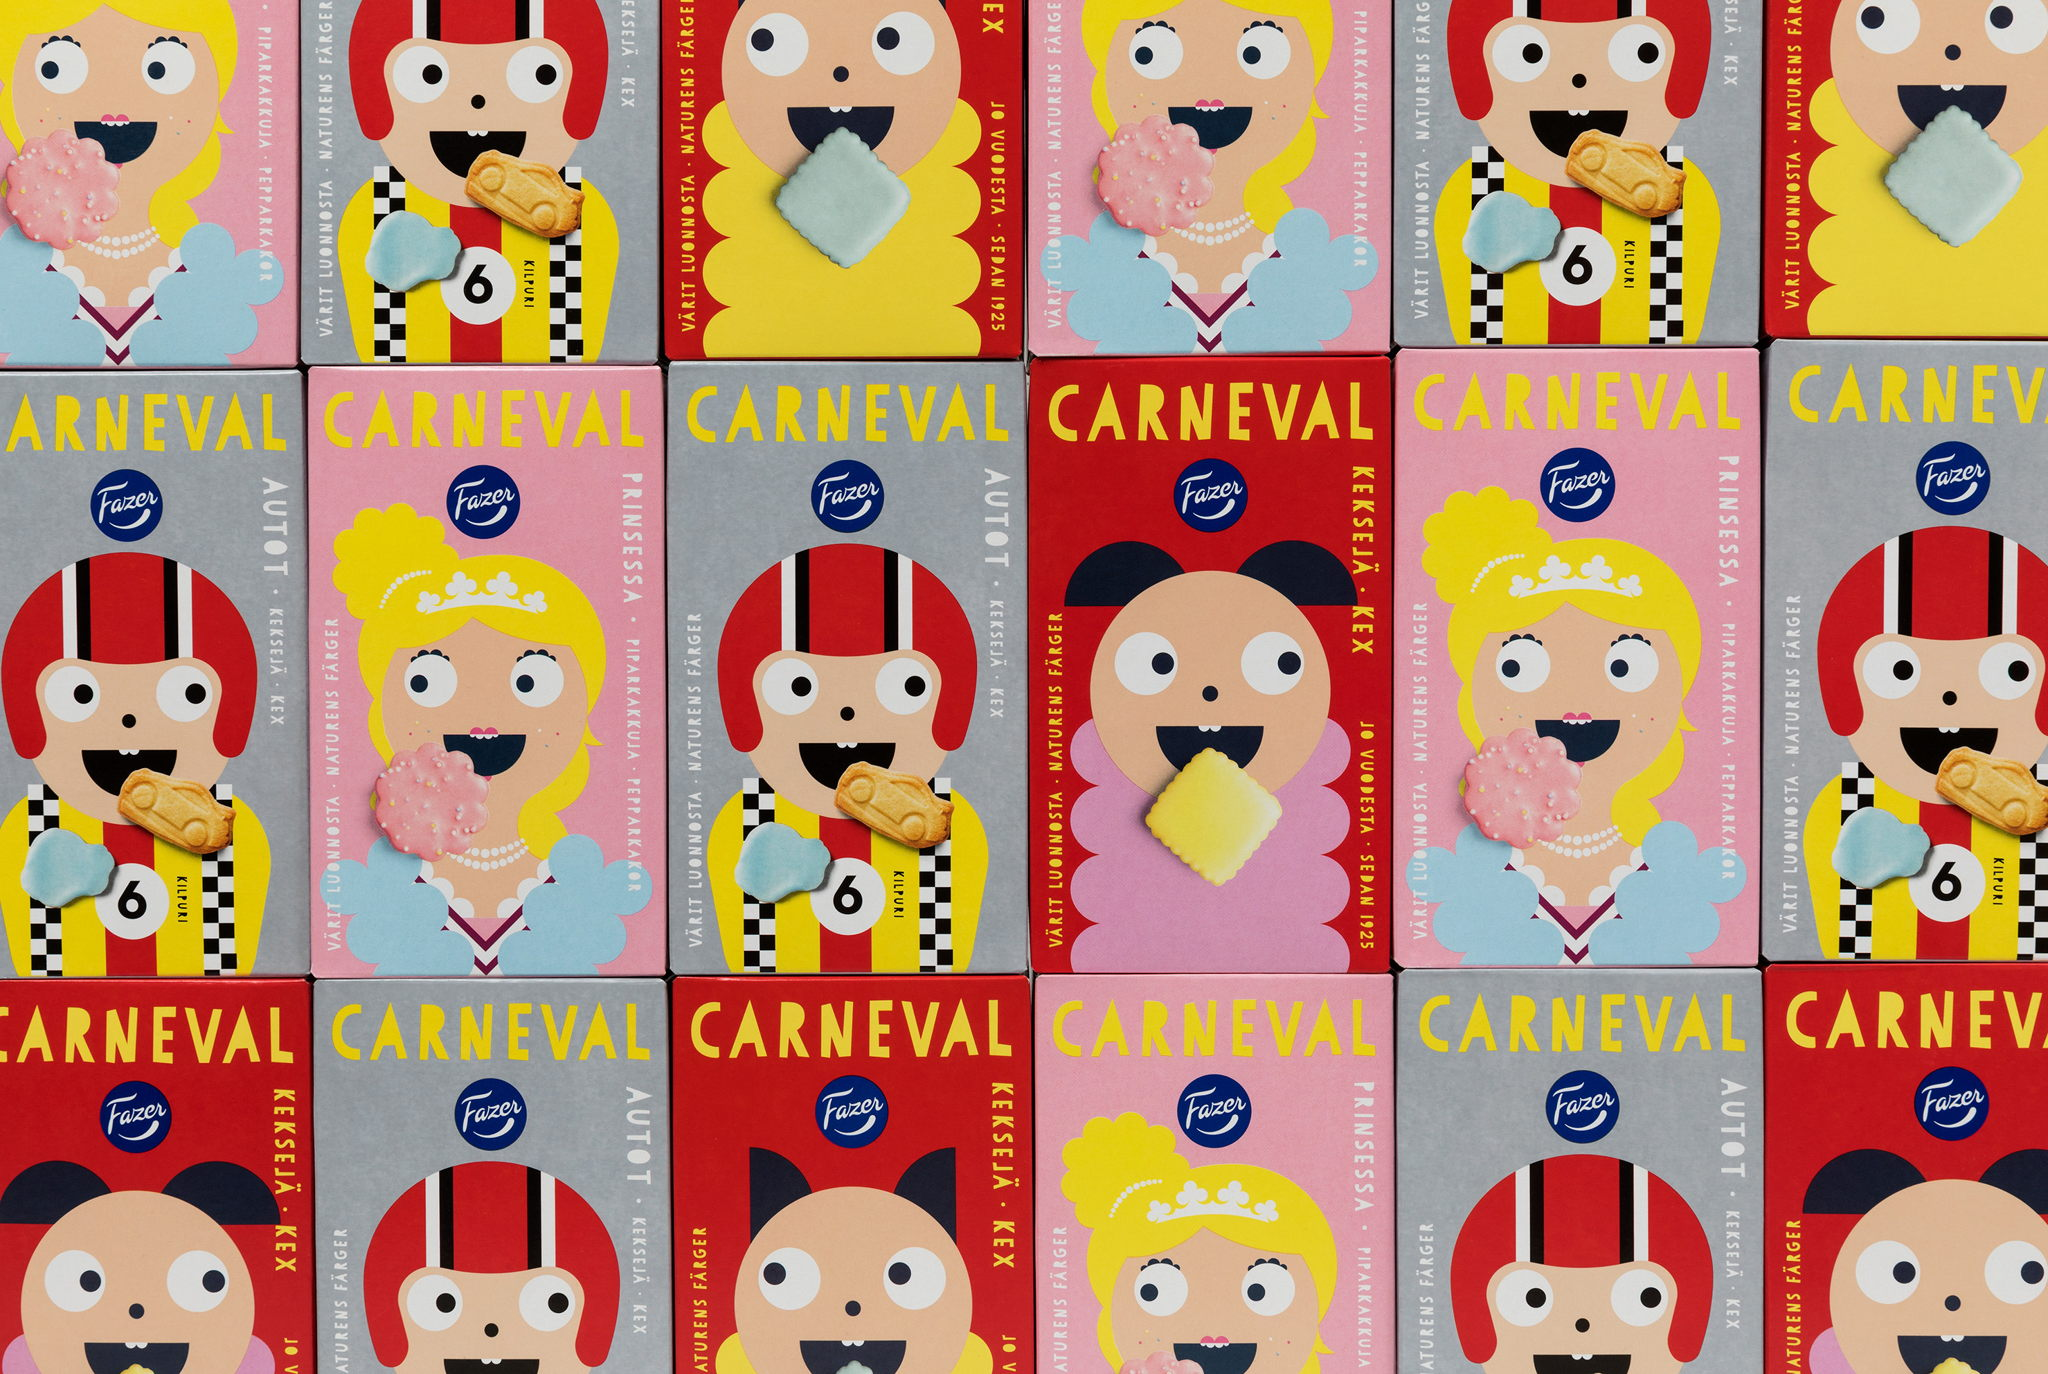 5_Kuudes_Carneval_Family.jpg